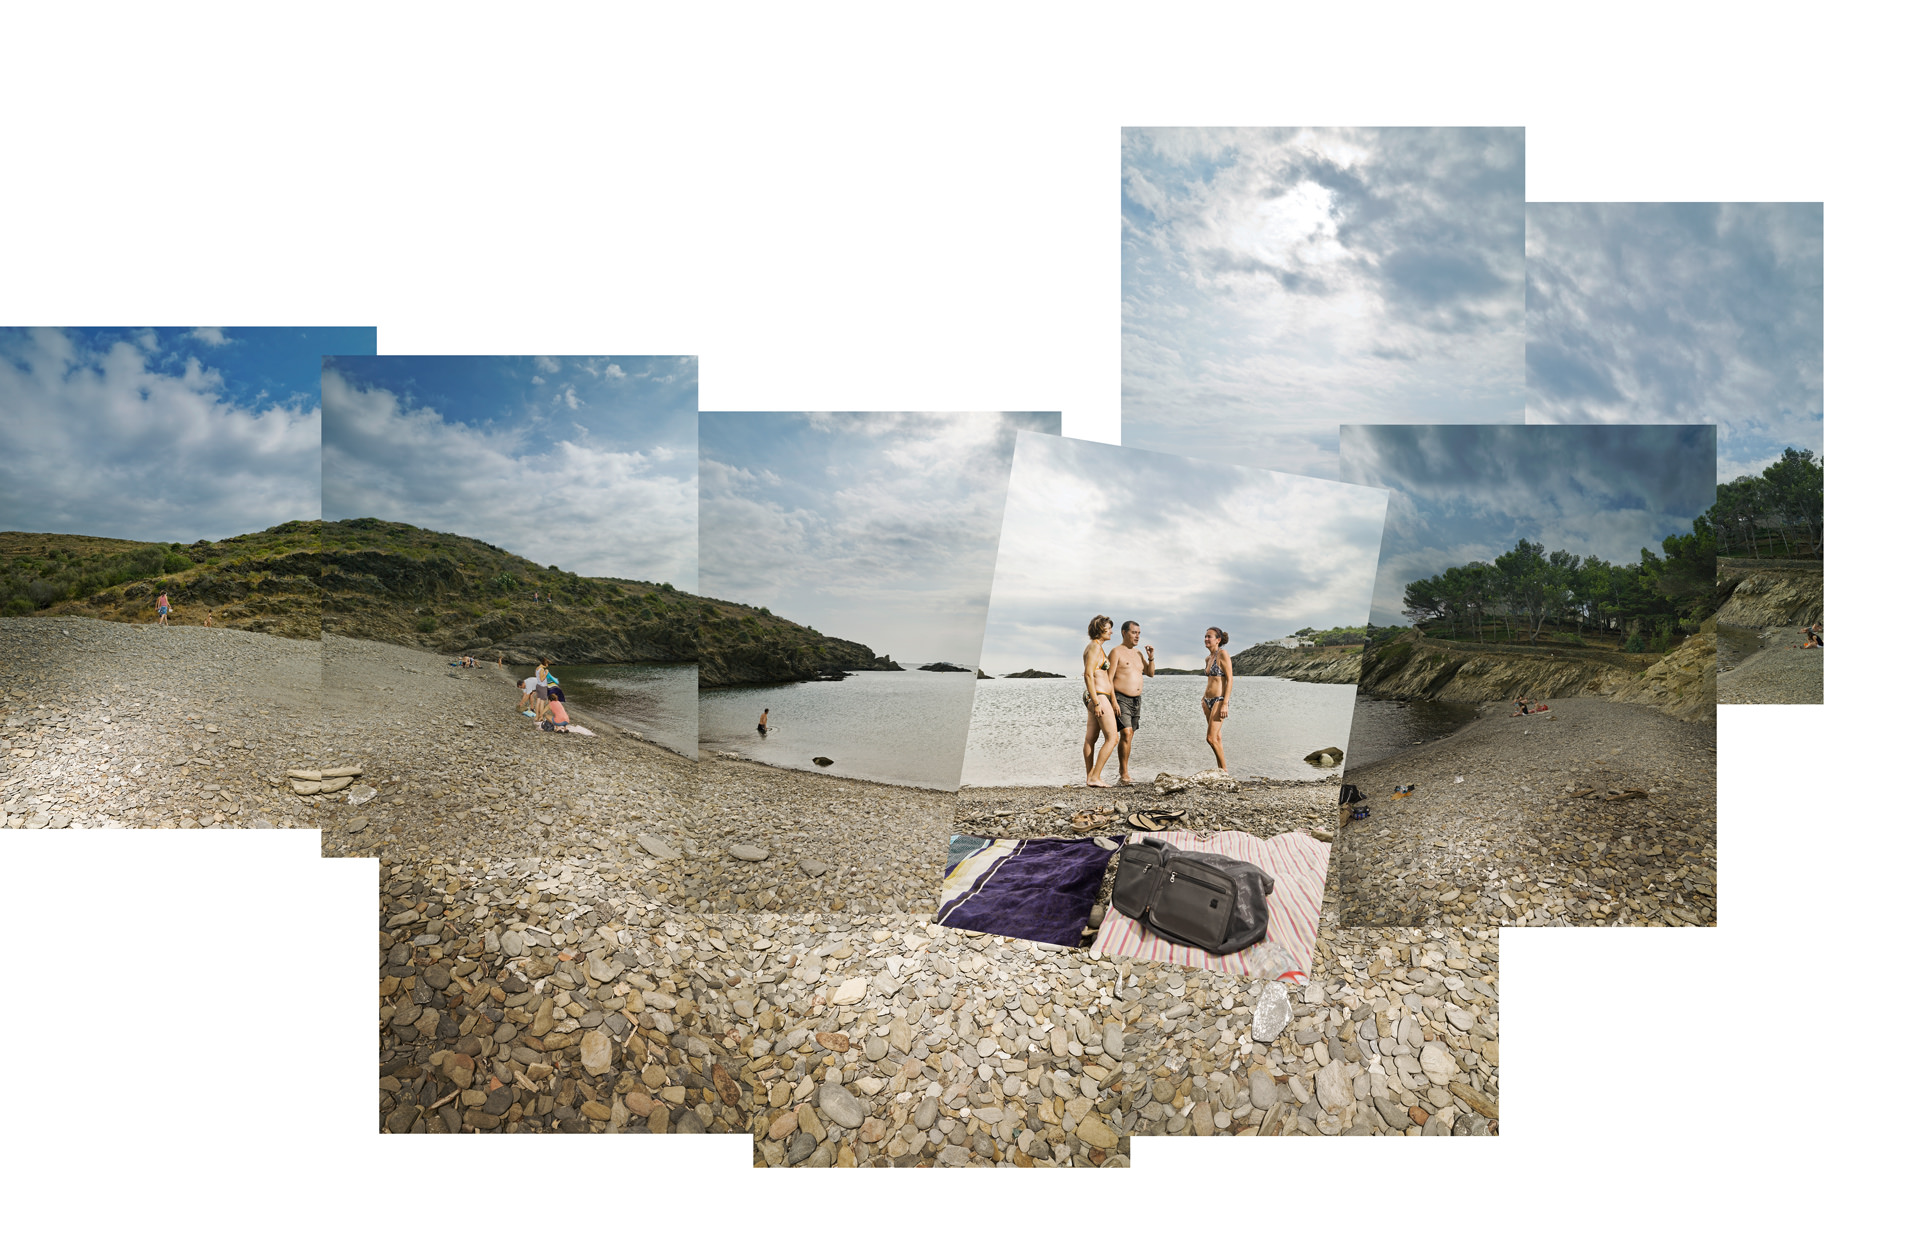 ©ankeluckmann644, ADAC, Reisemagazin, beach, spain, costa brava, people, landscape